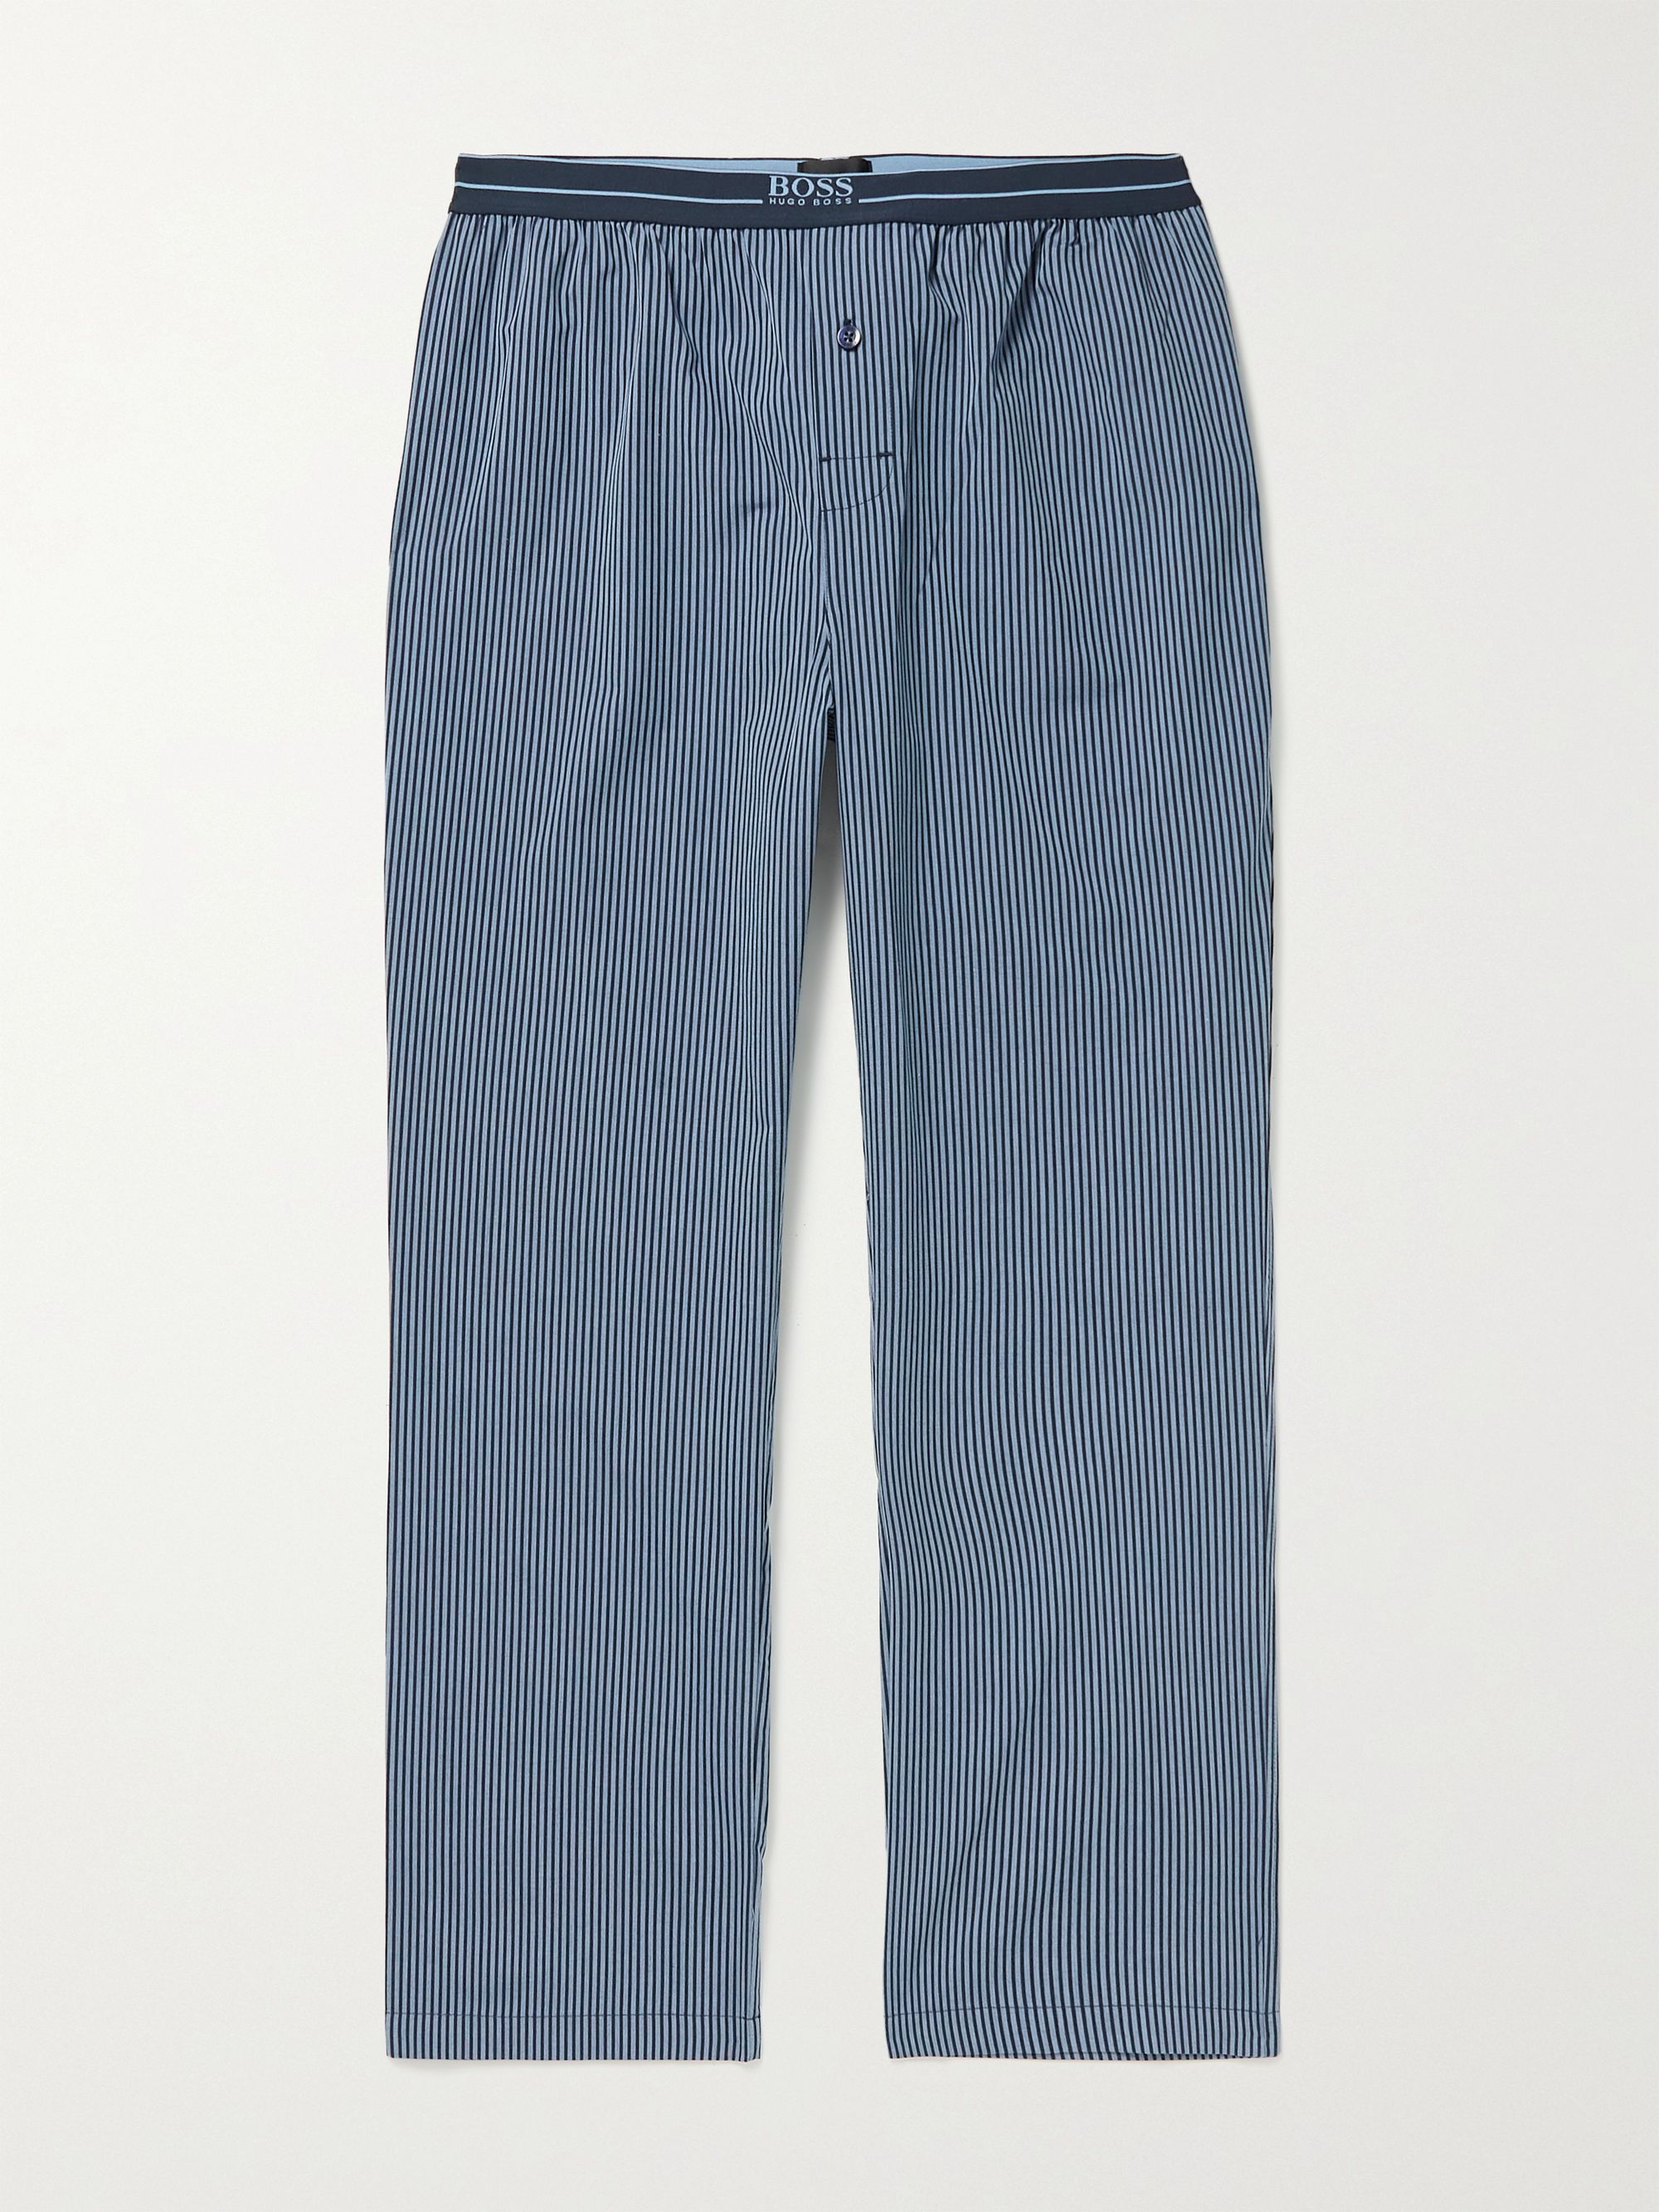 HUGO BOSS Striped Cotton-Poplin Pyjama Trousers